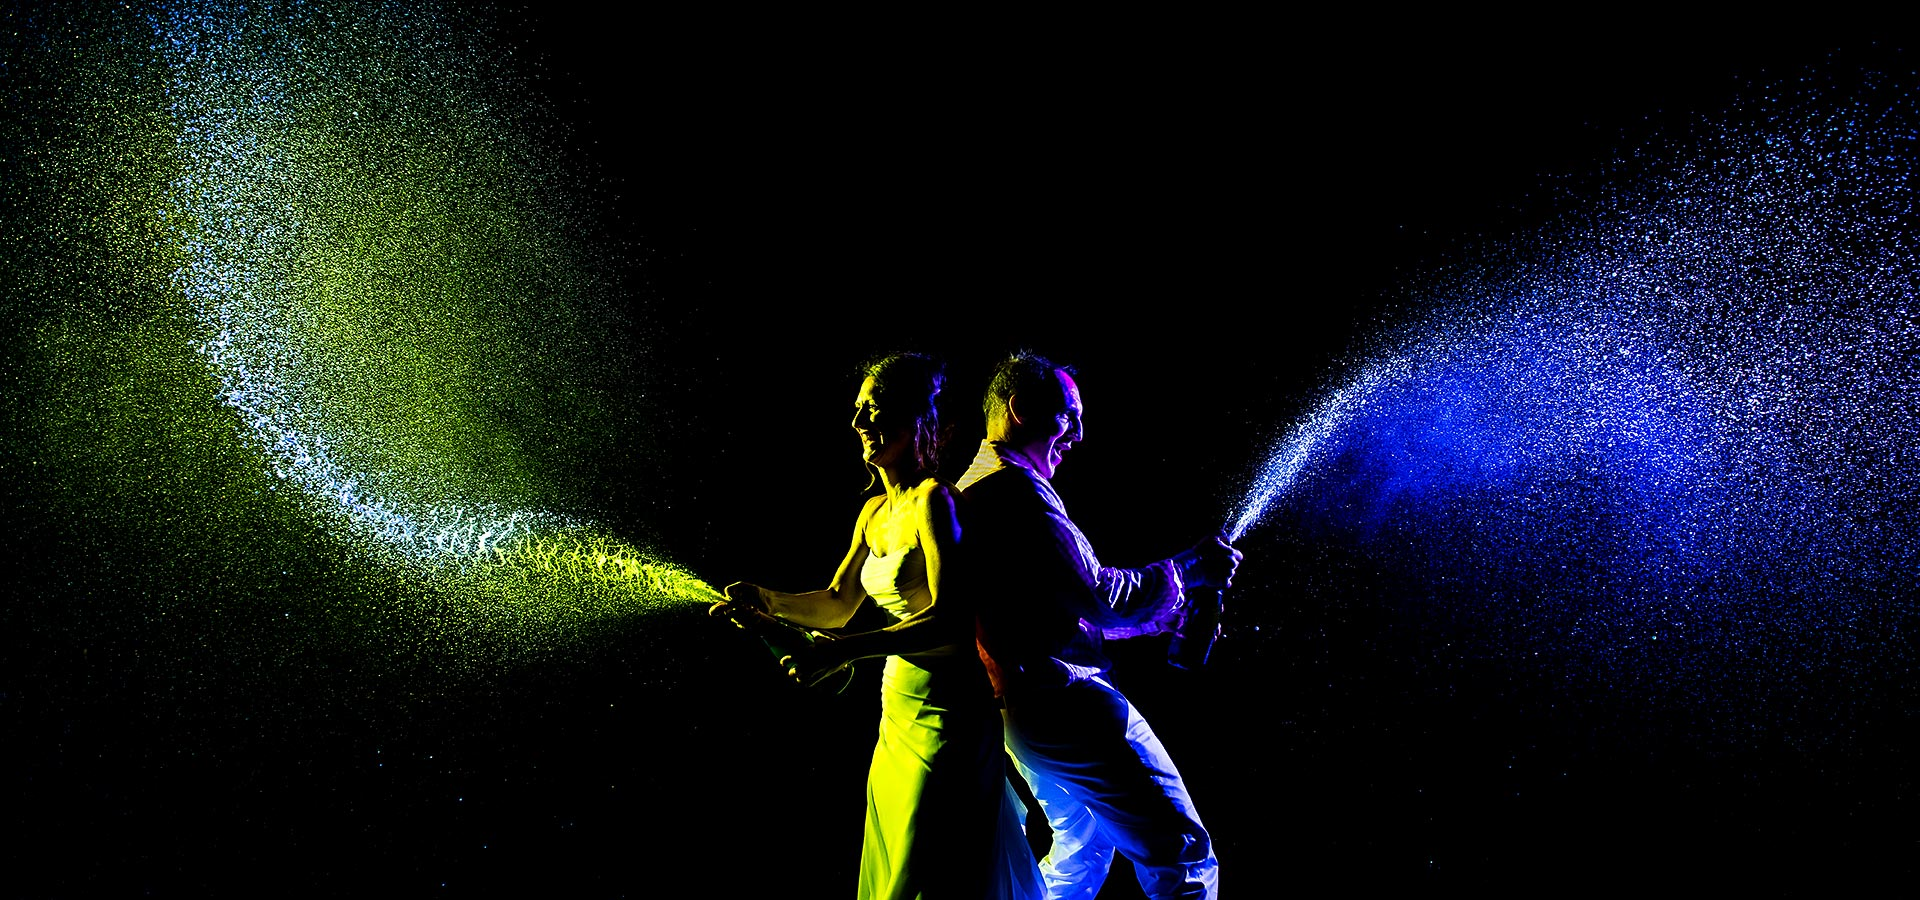 Bride and Groom Popping Bottles | Chautauqua Dining Hall Wedding | Boulder Wedding Photographer | J. La Plante Photo